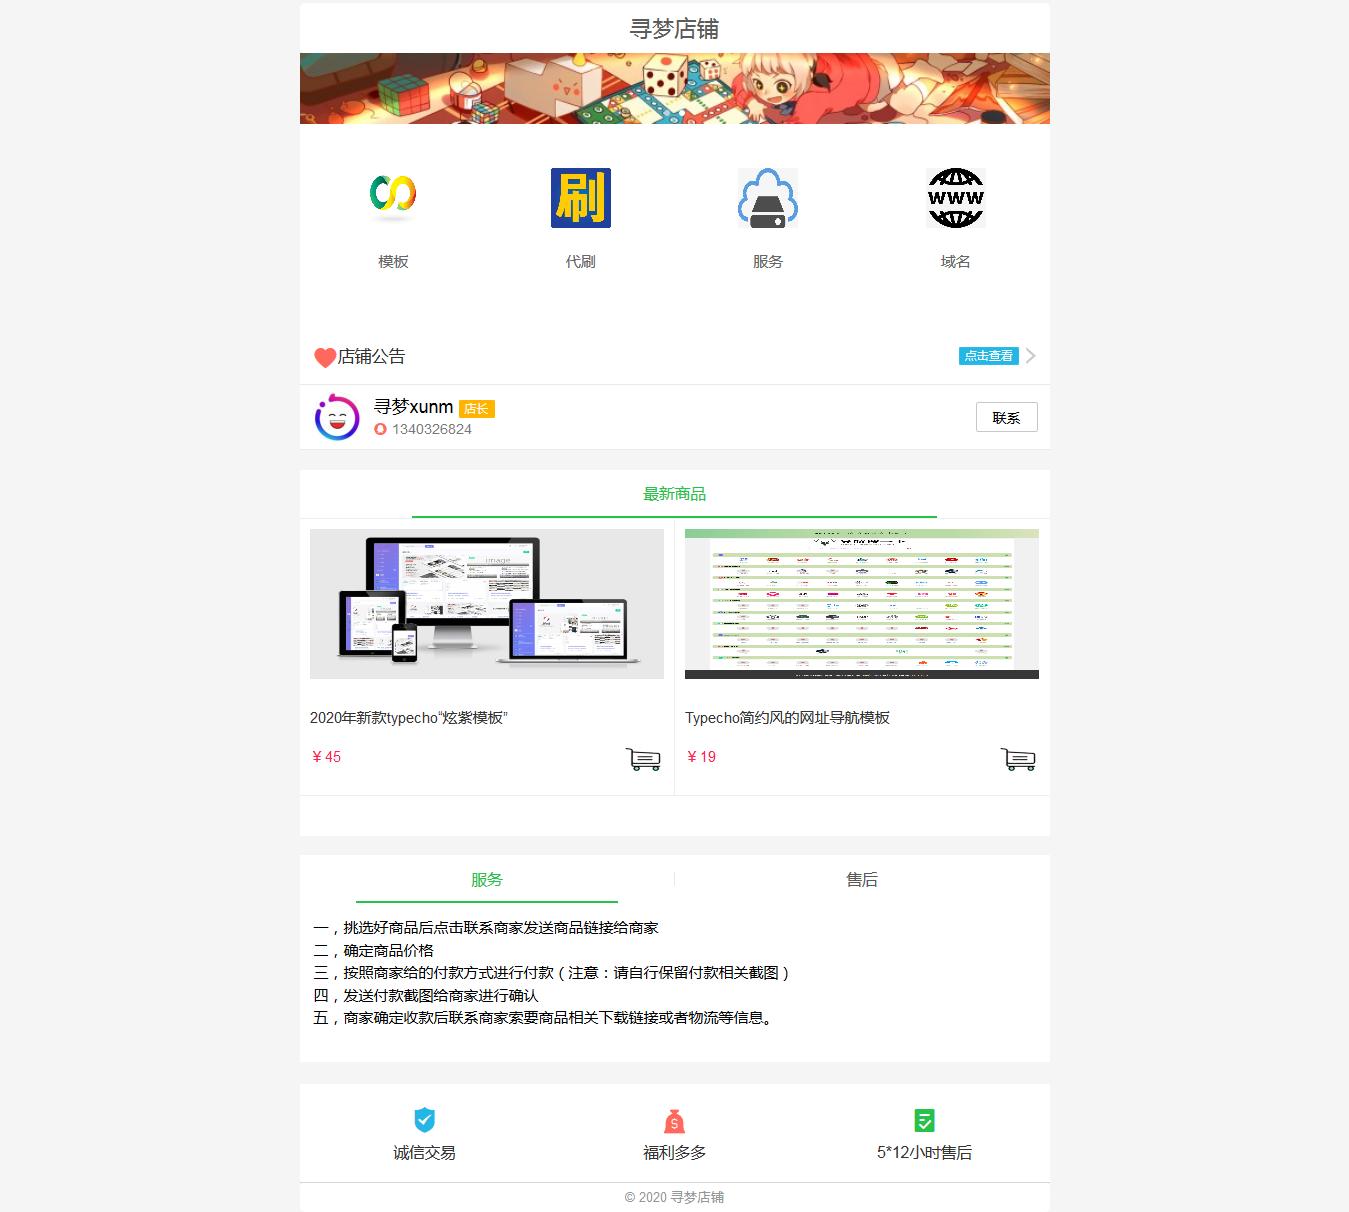 Typecho手机版简约风格商店模板